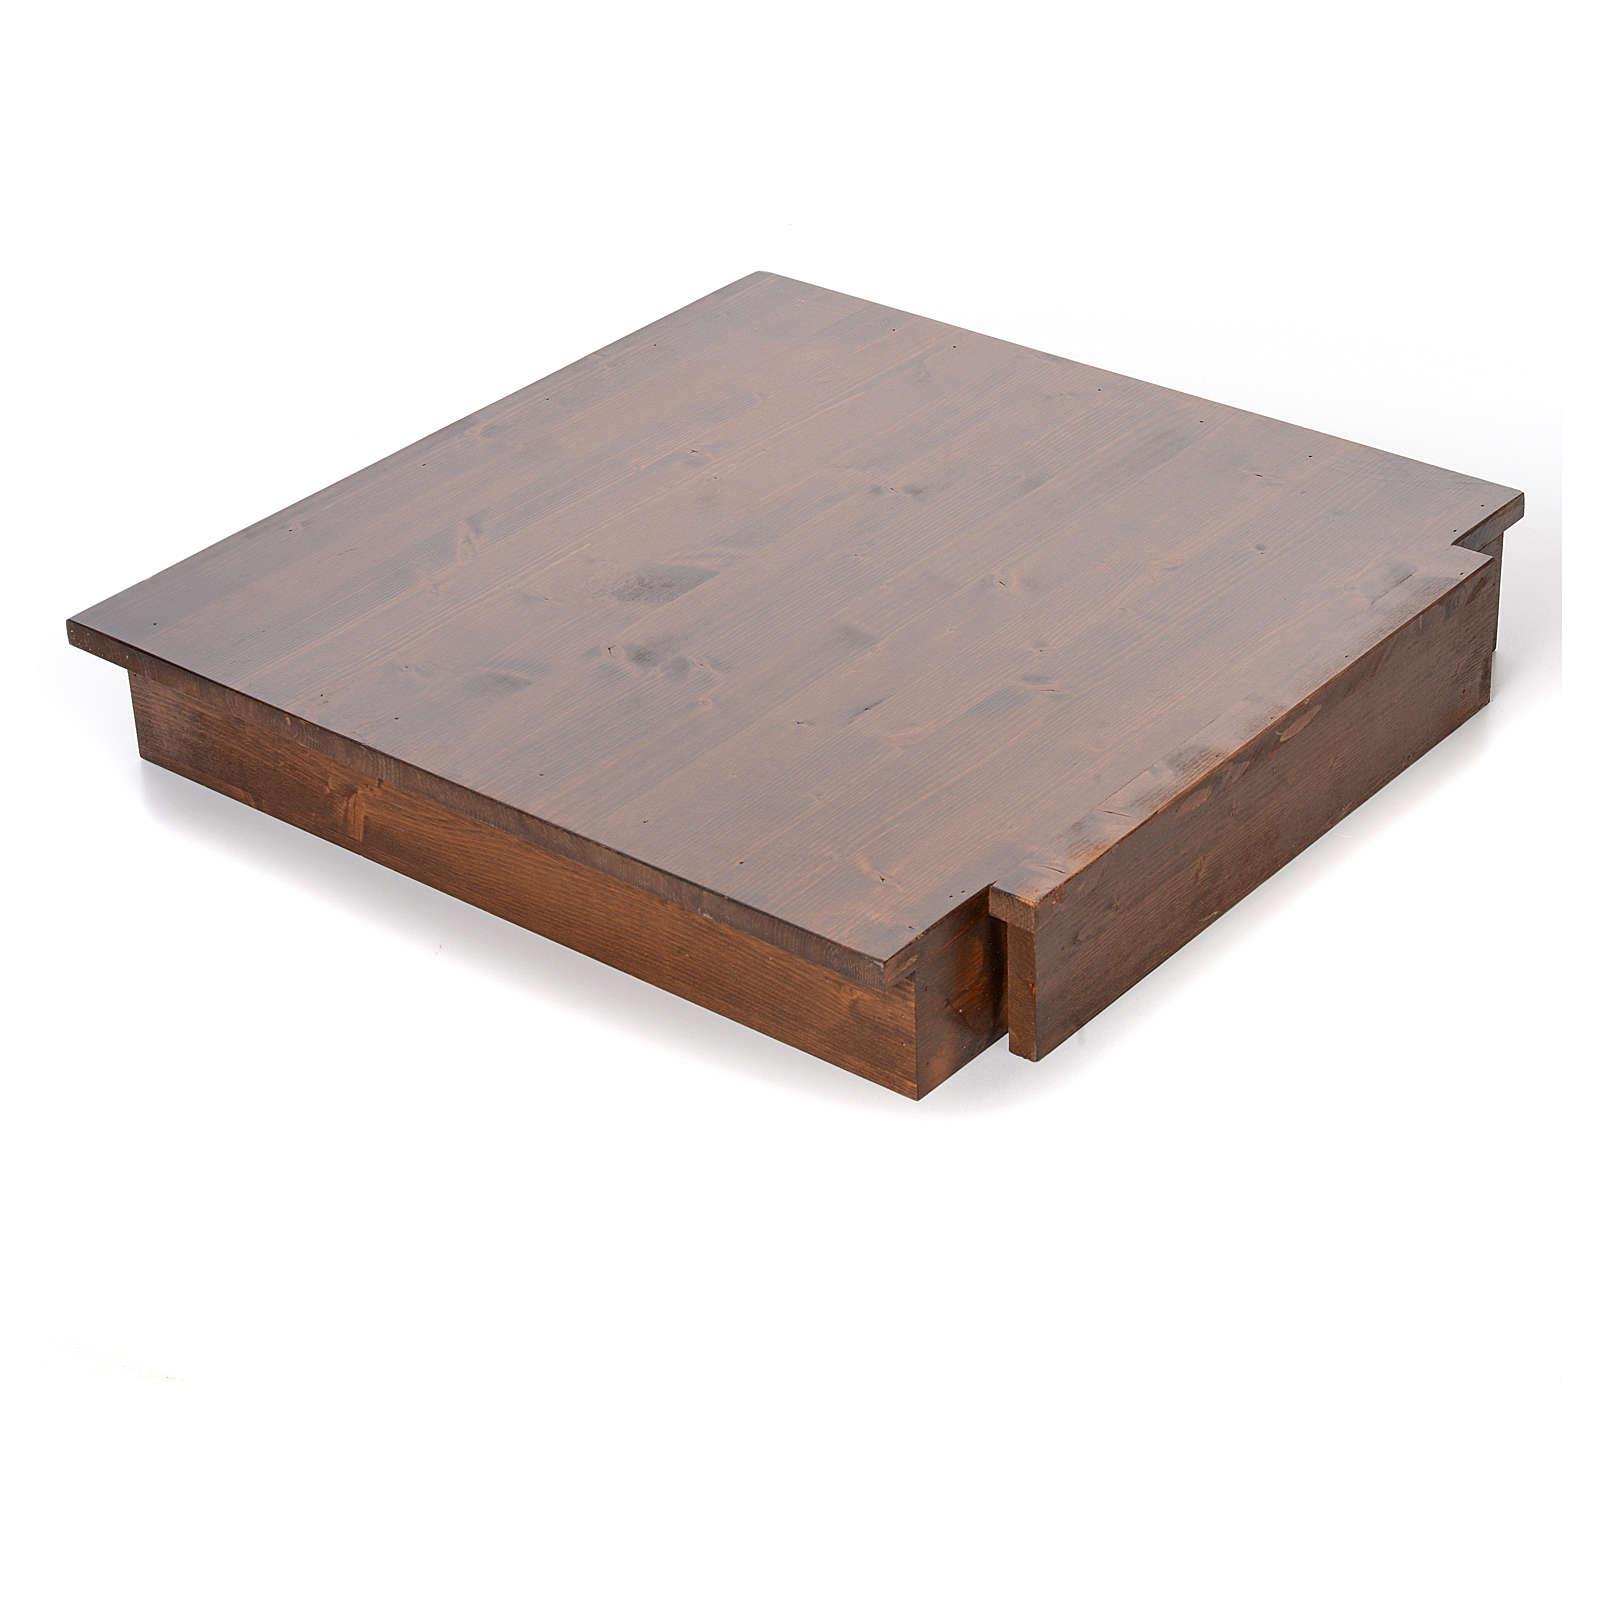 Estrade En Bois Occasion ambon en bois massif avec estrade 135x66x50 cm | vente en